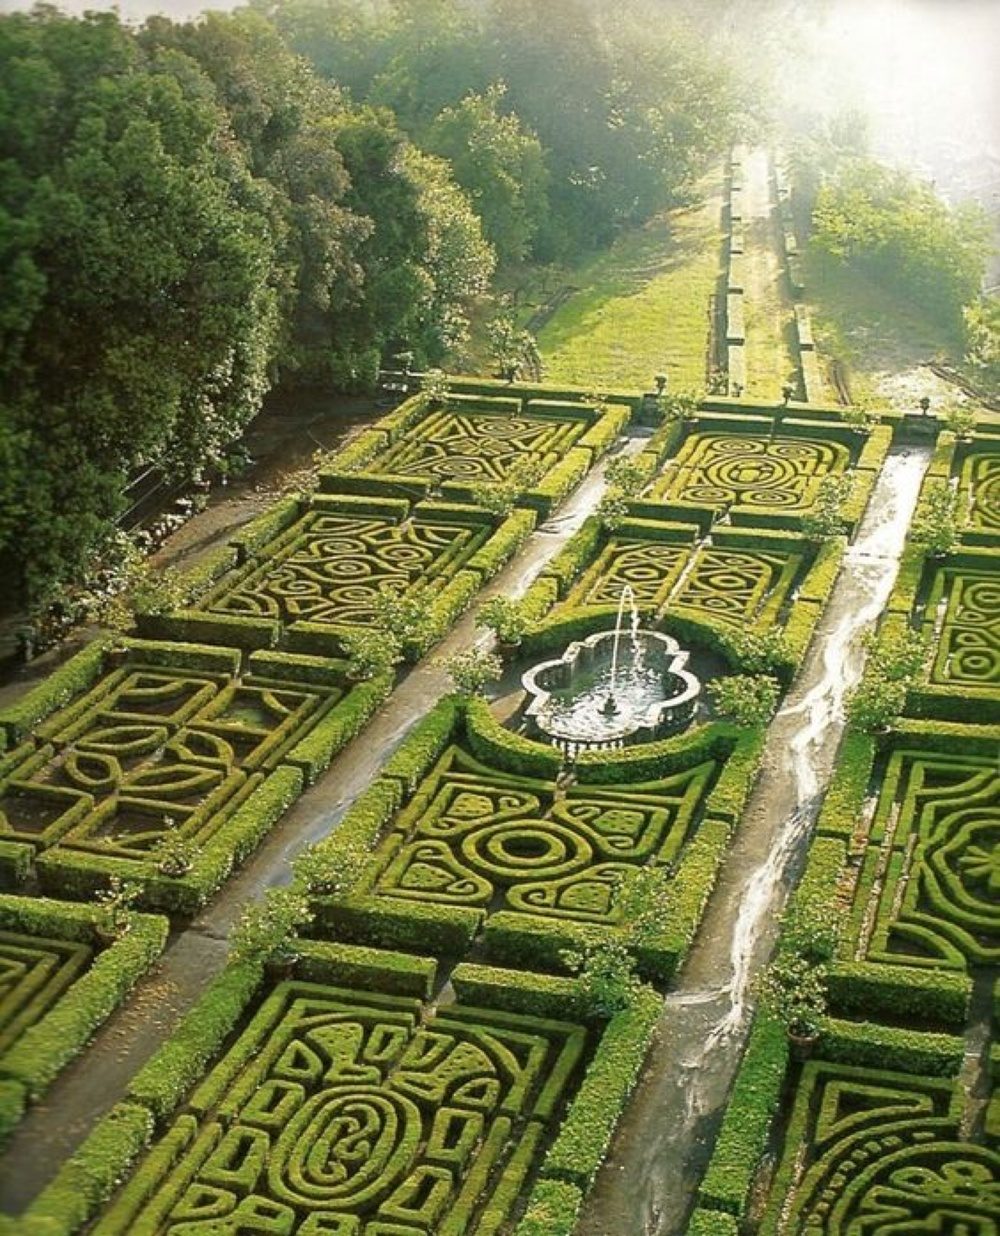 Maze Gardens at Ruspoli Castle, Northern Lazio, Italy